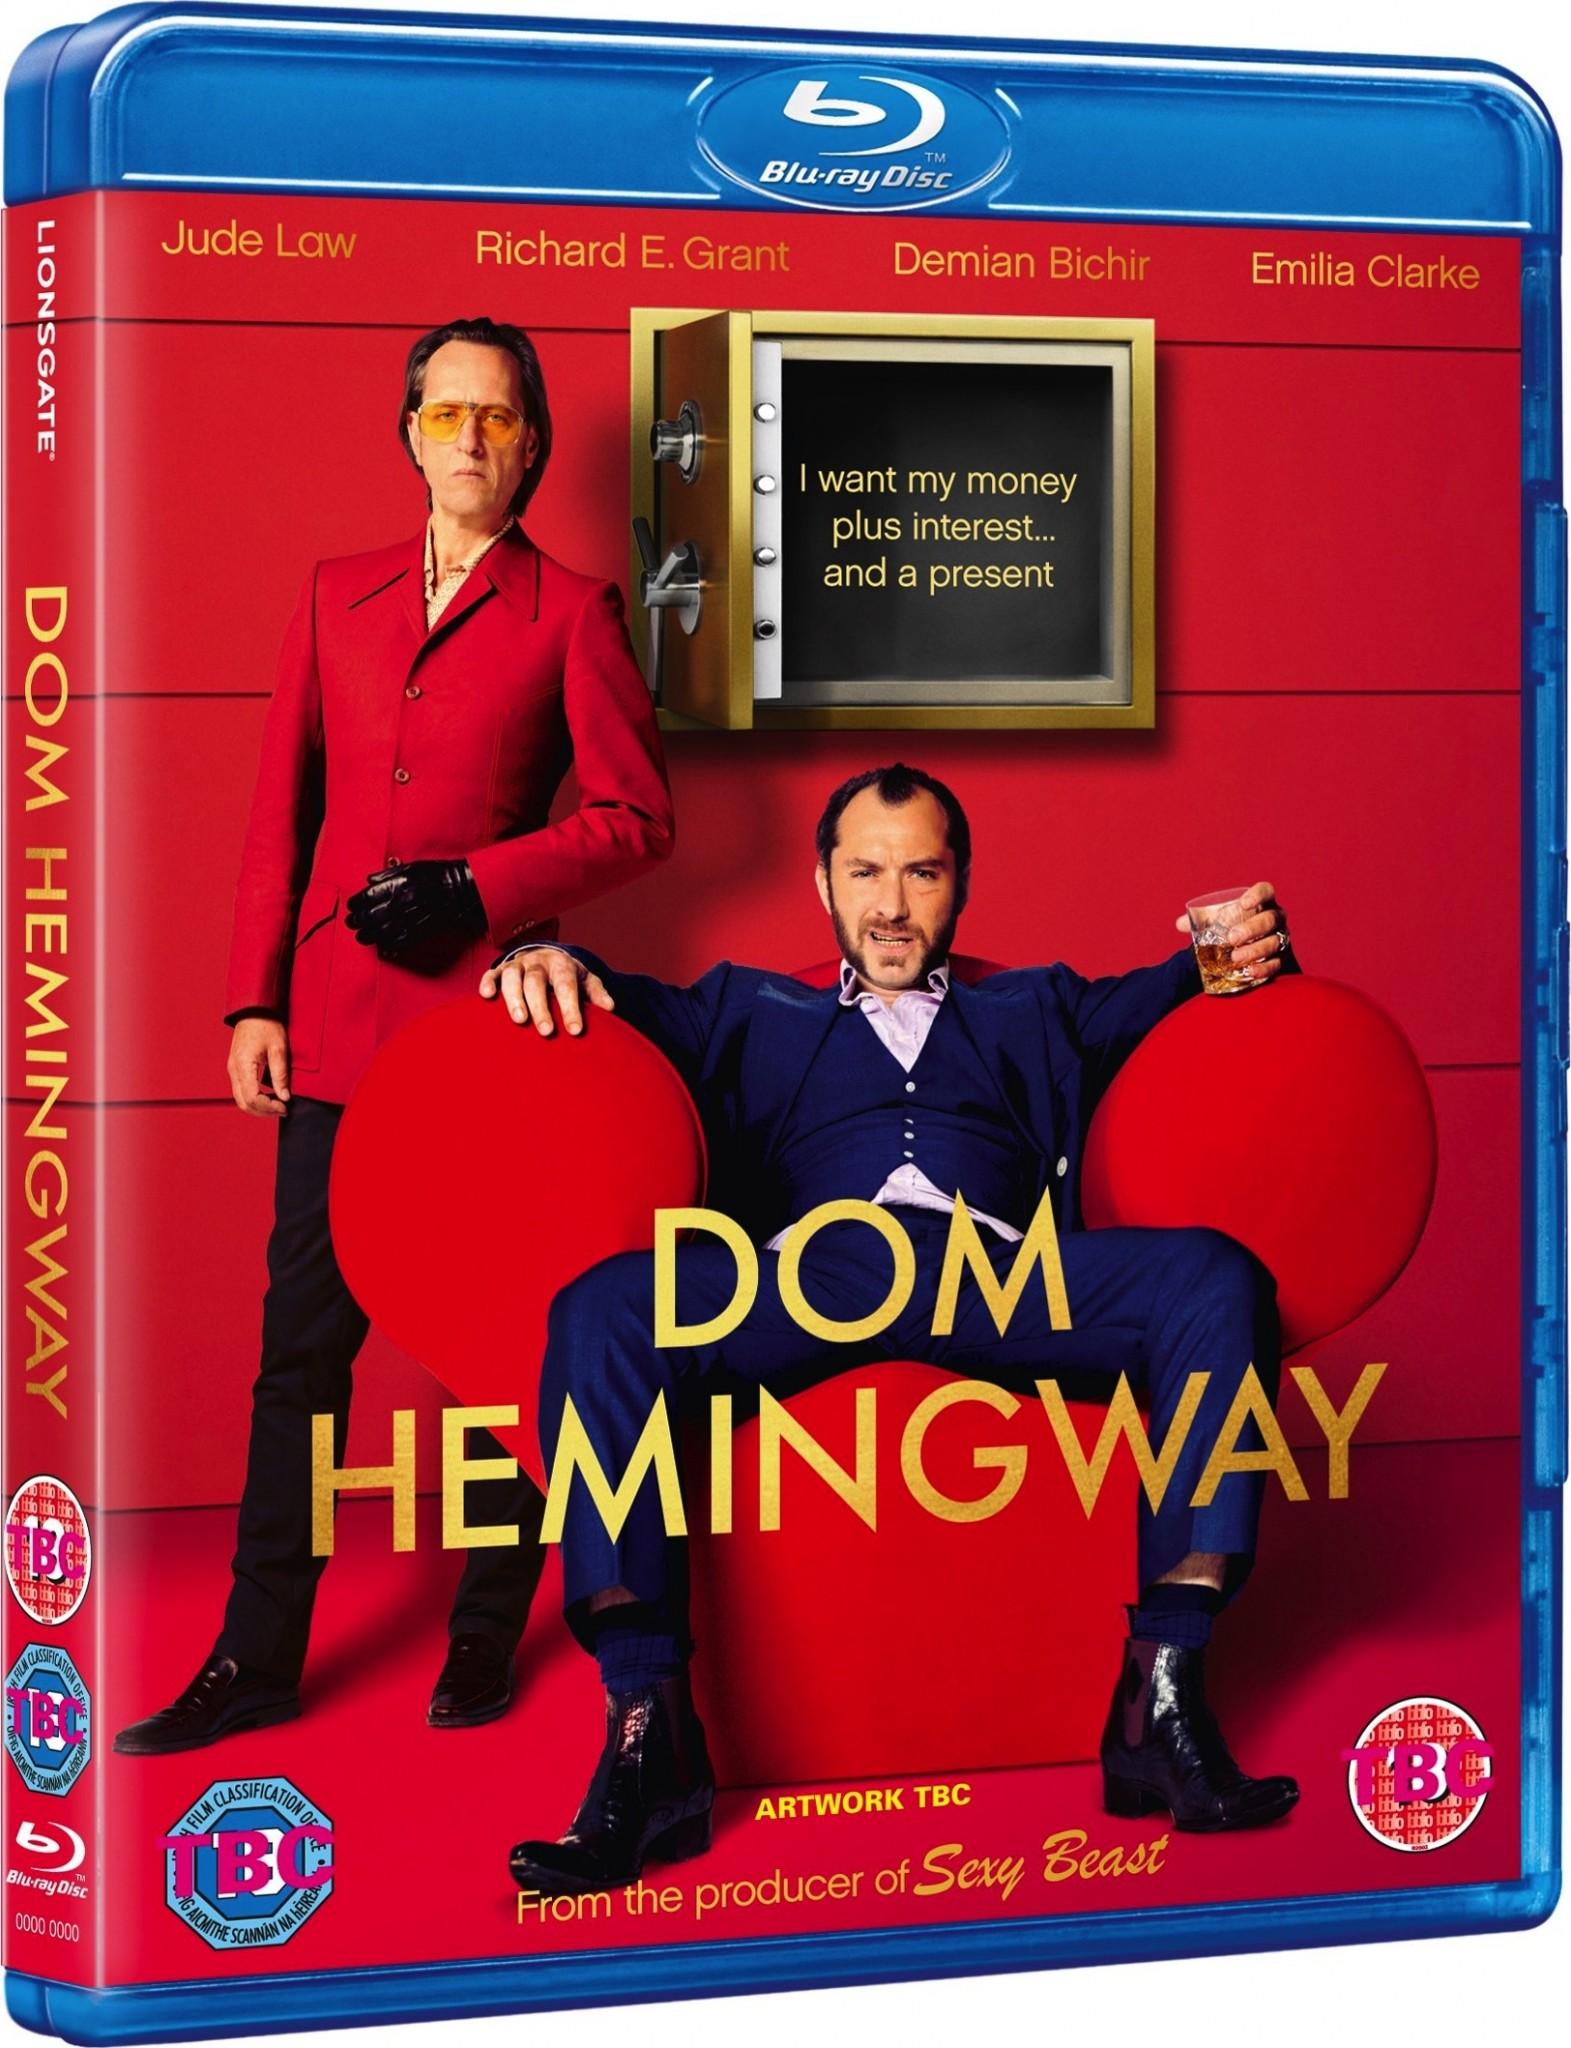 Dom Hemingway (2013) Movies Watch online in hd 720px